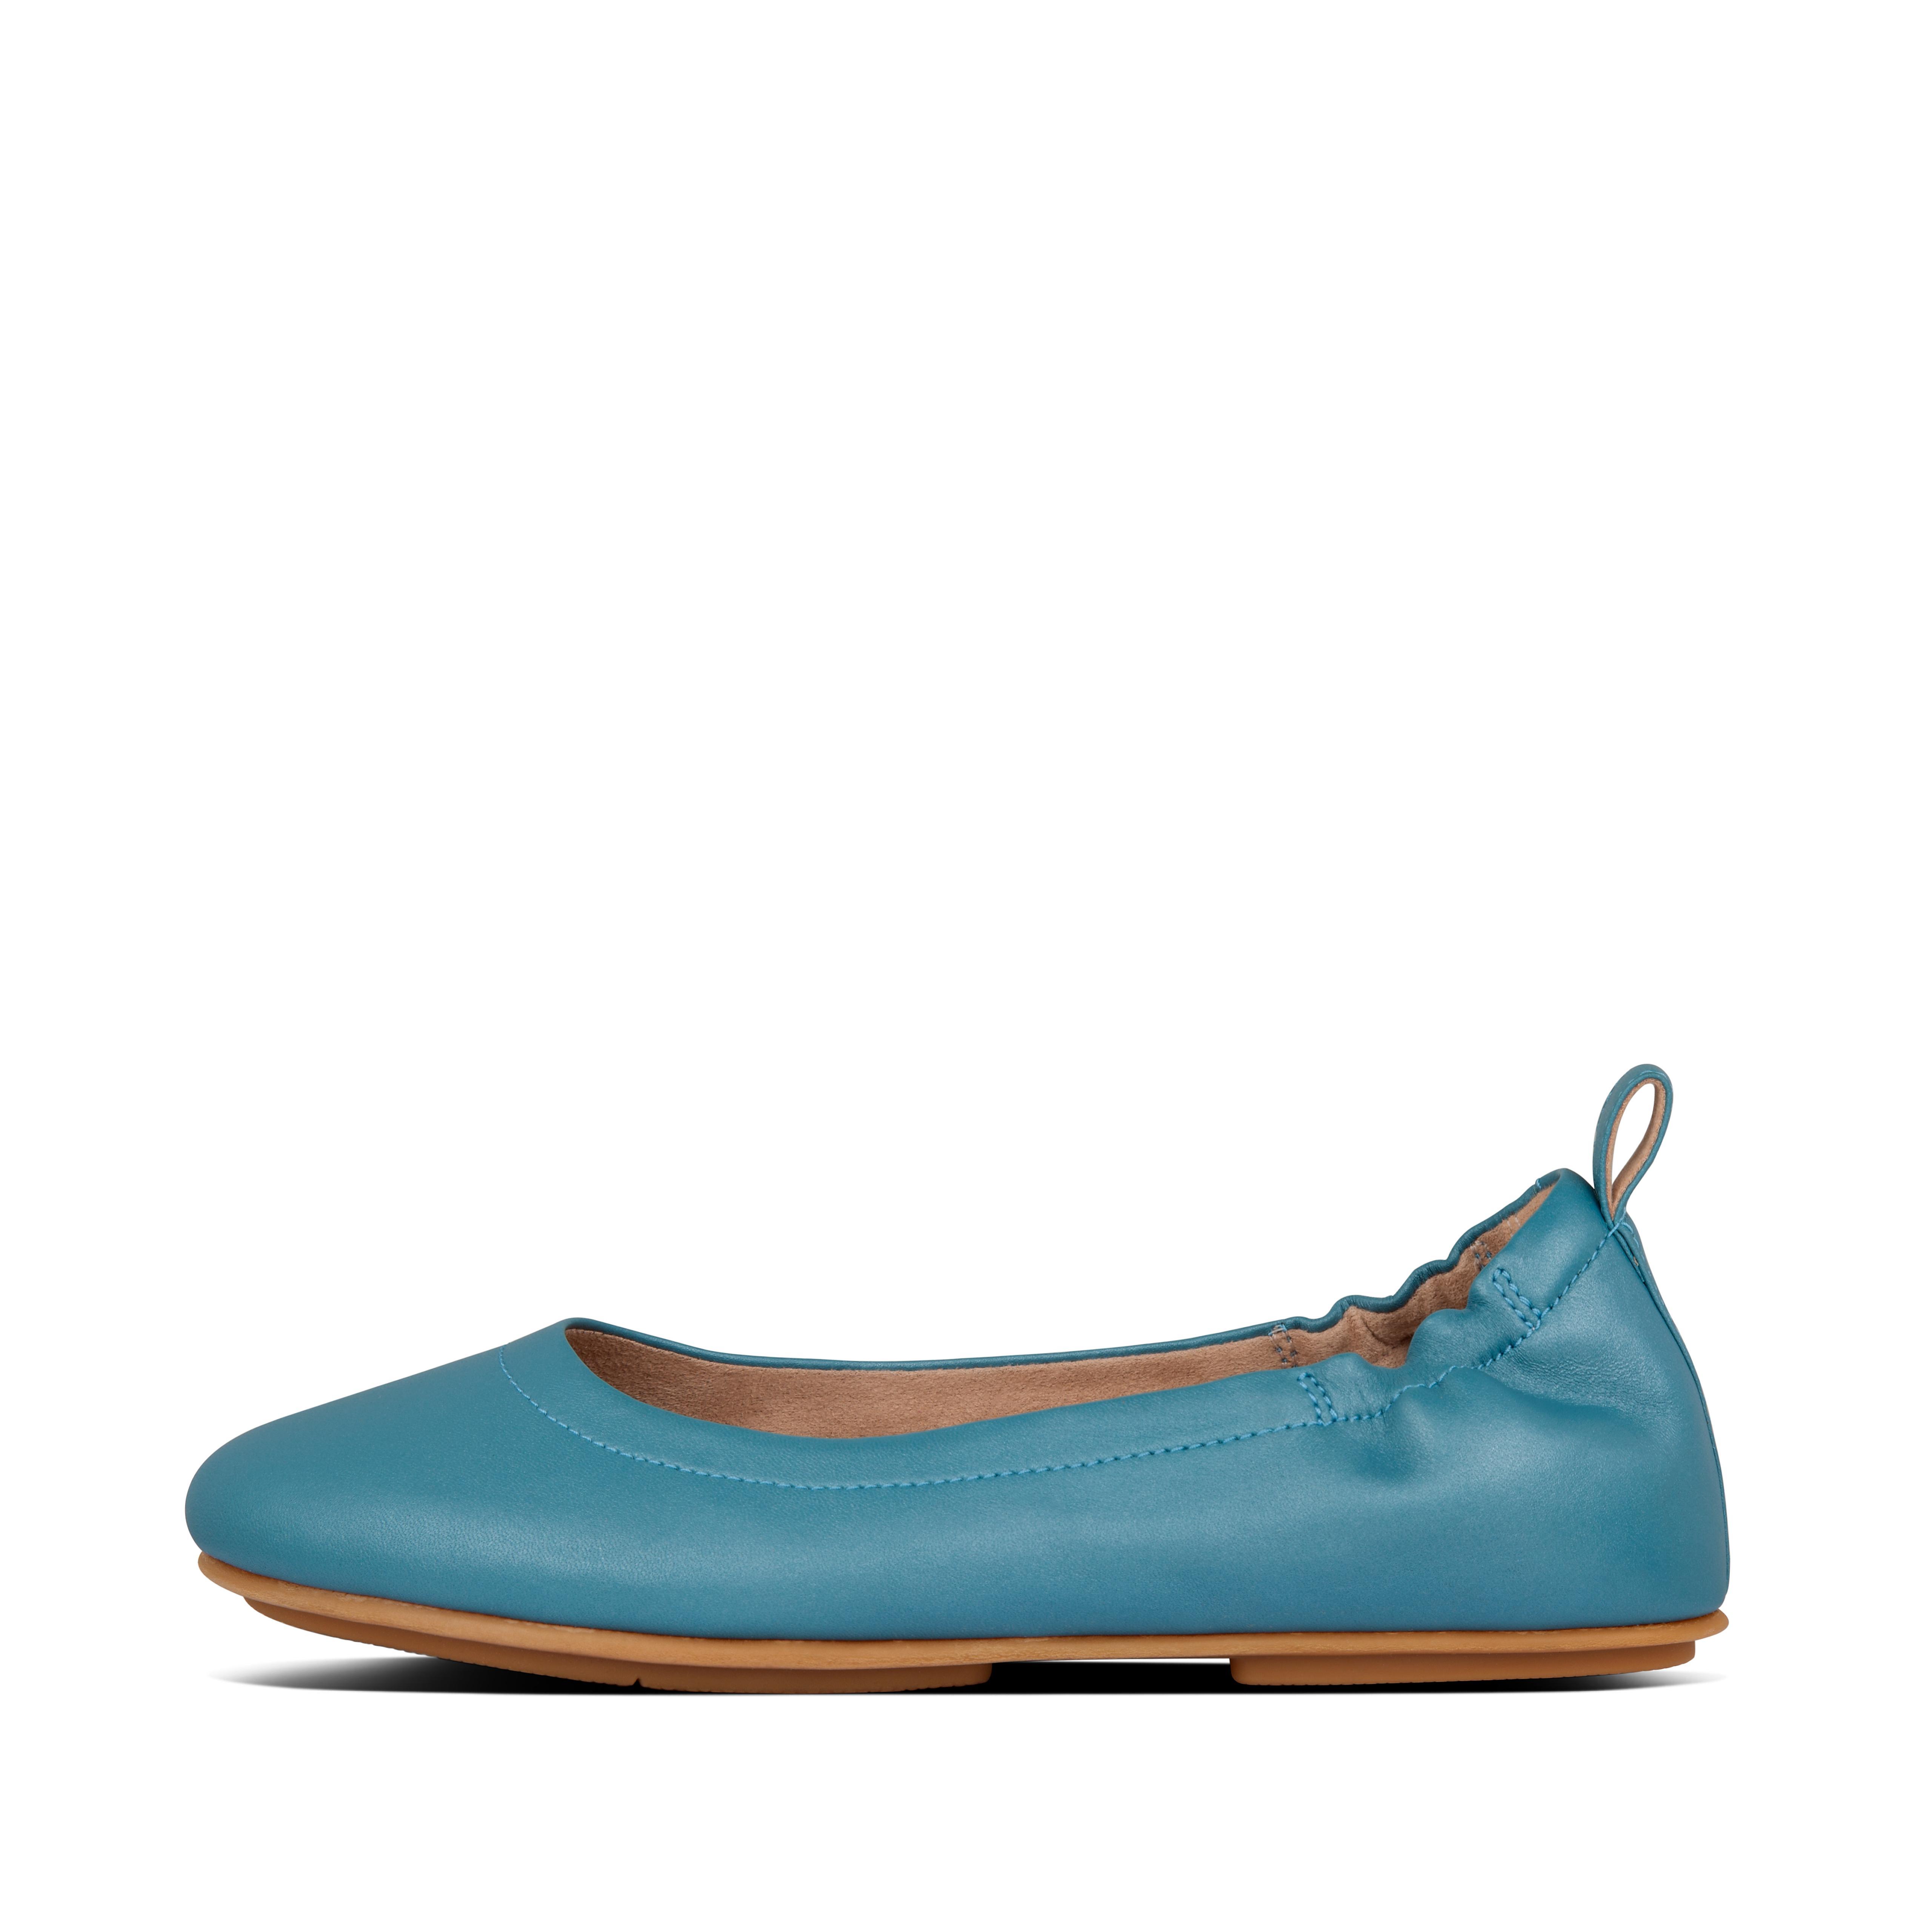 Allegro metallic ballerinas turquoise x69 730?v=6